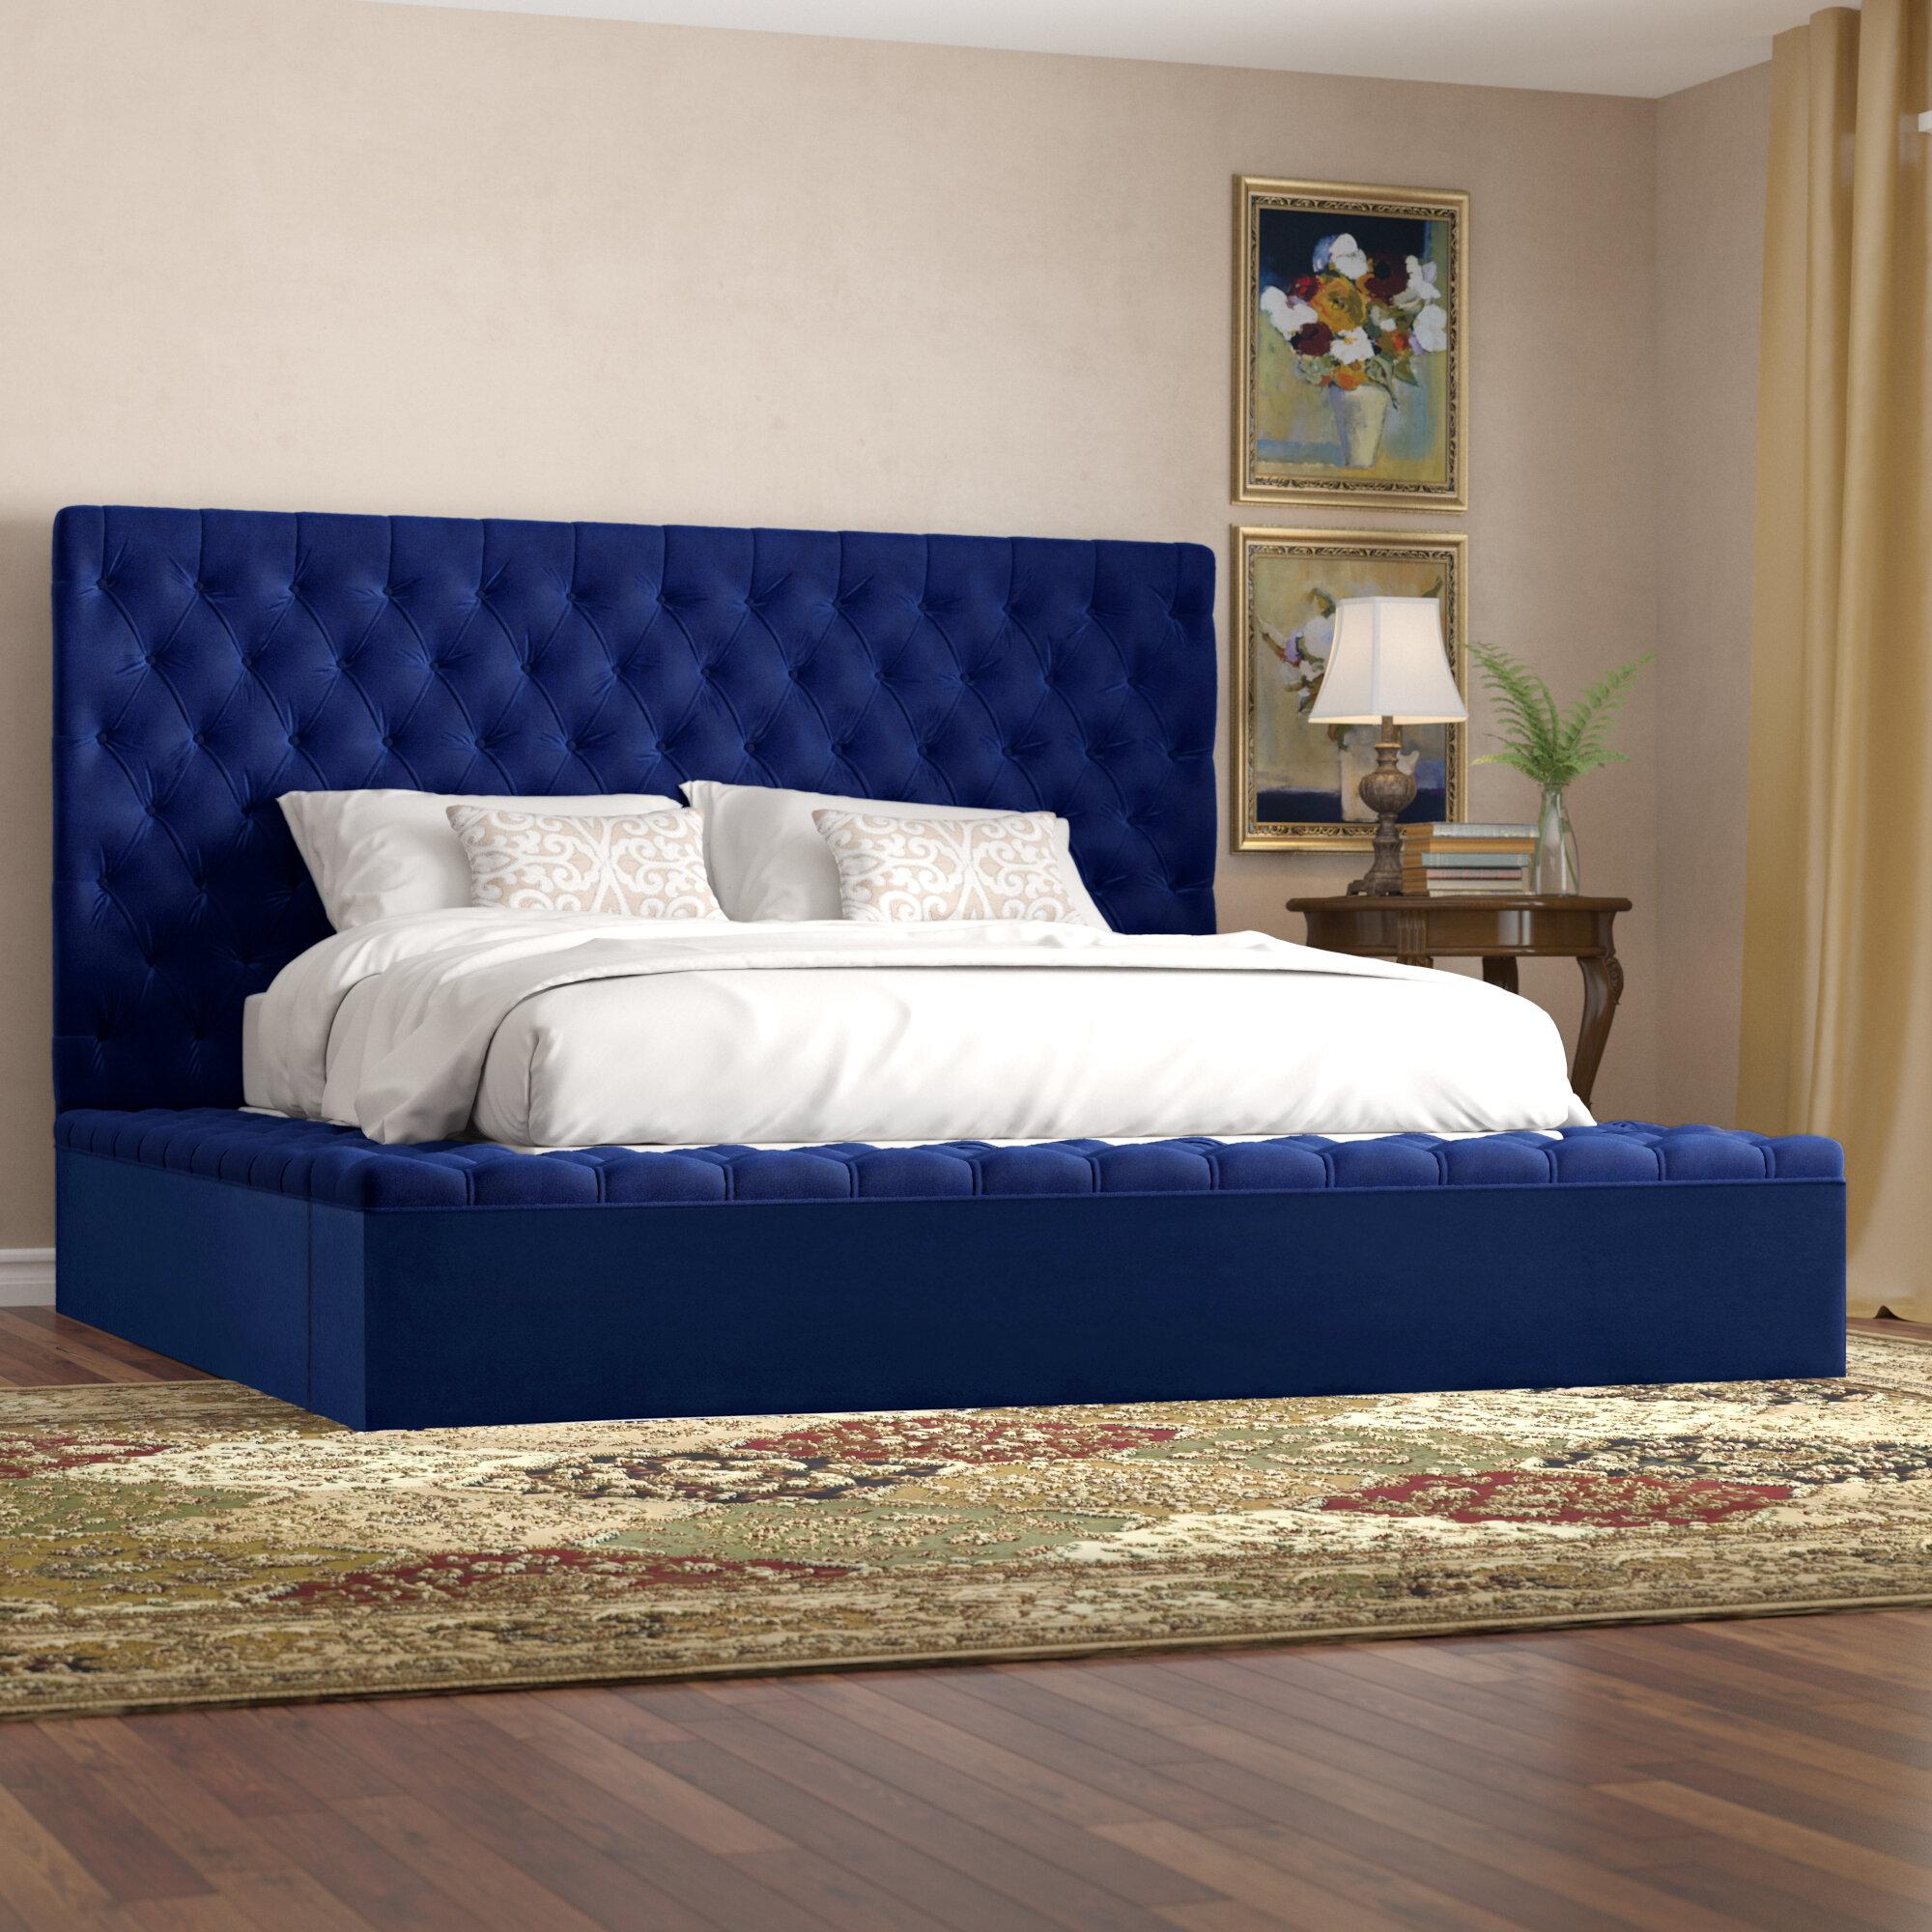 Willa Arlo Interiors Geralyn Upholstered Storage Platform Bed Reviews Wayfair